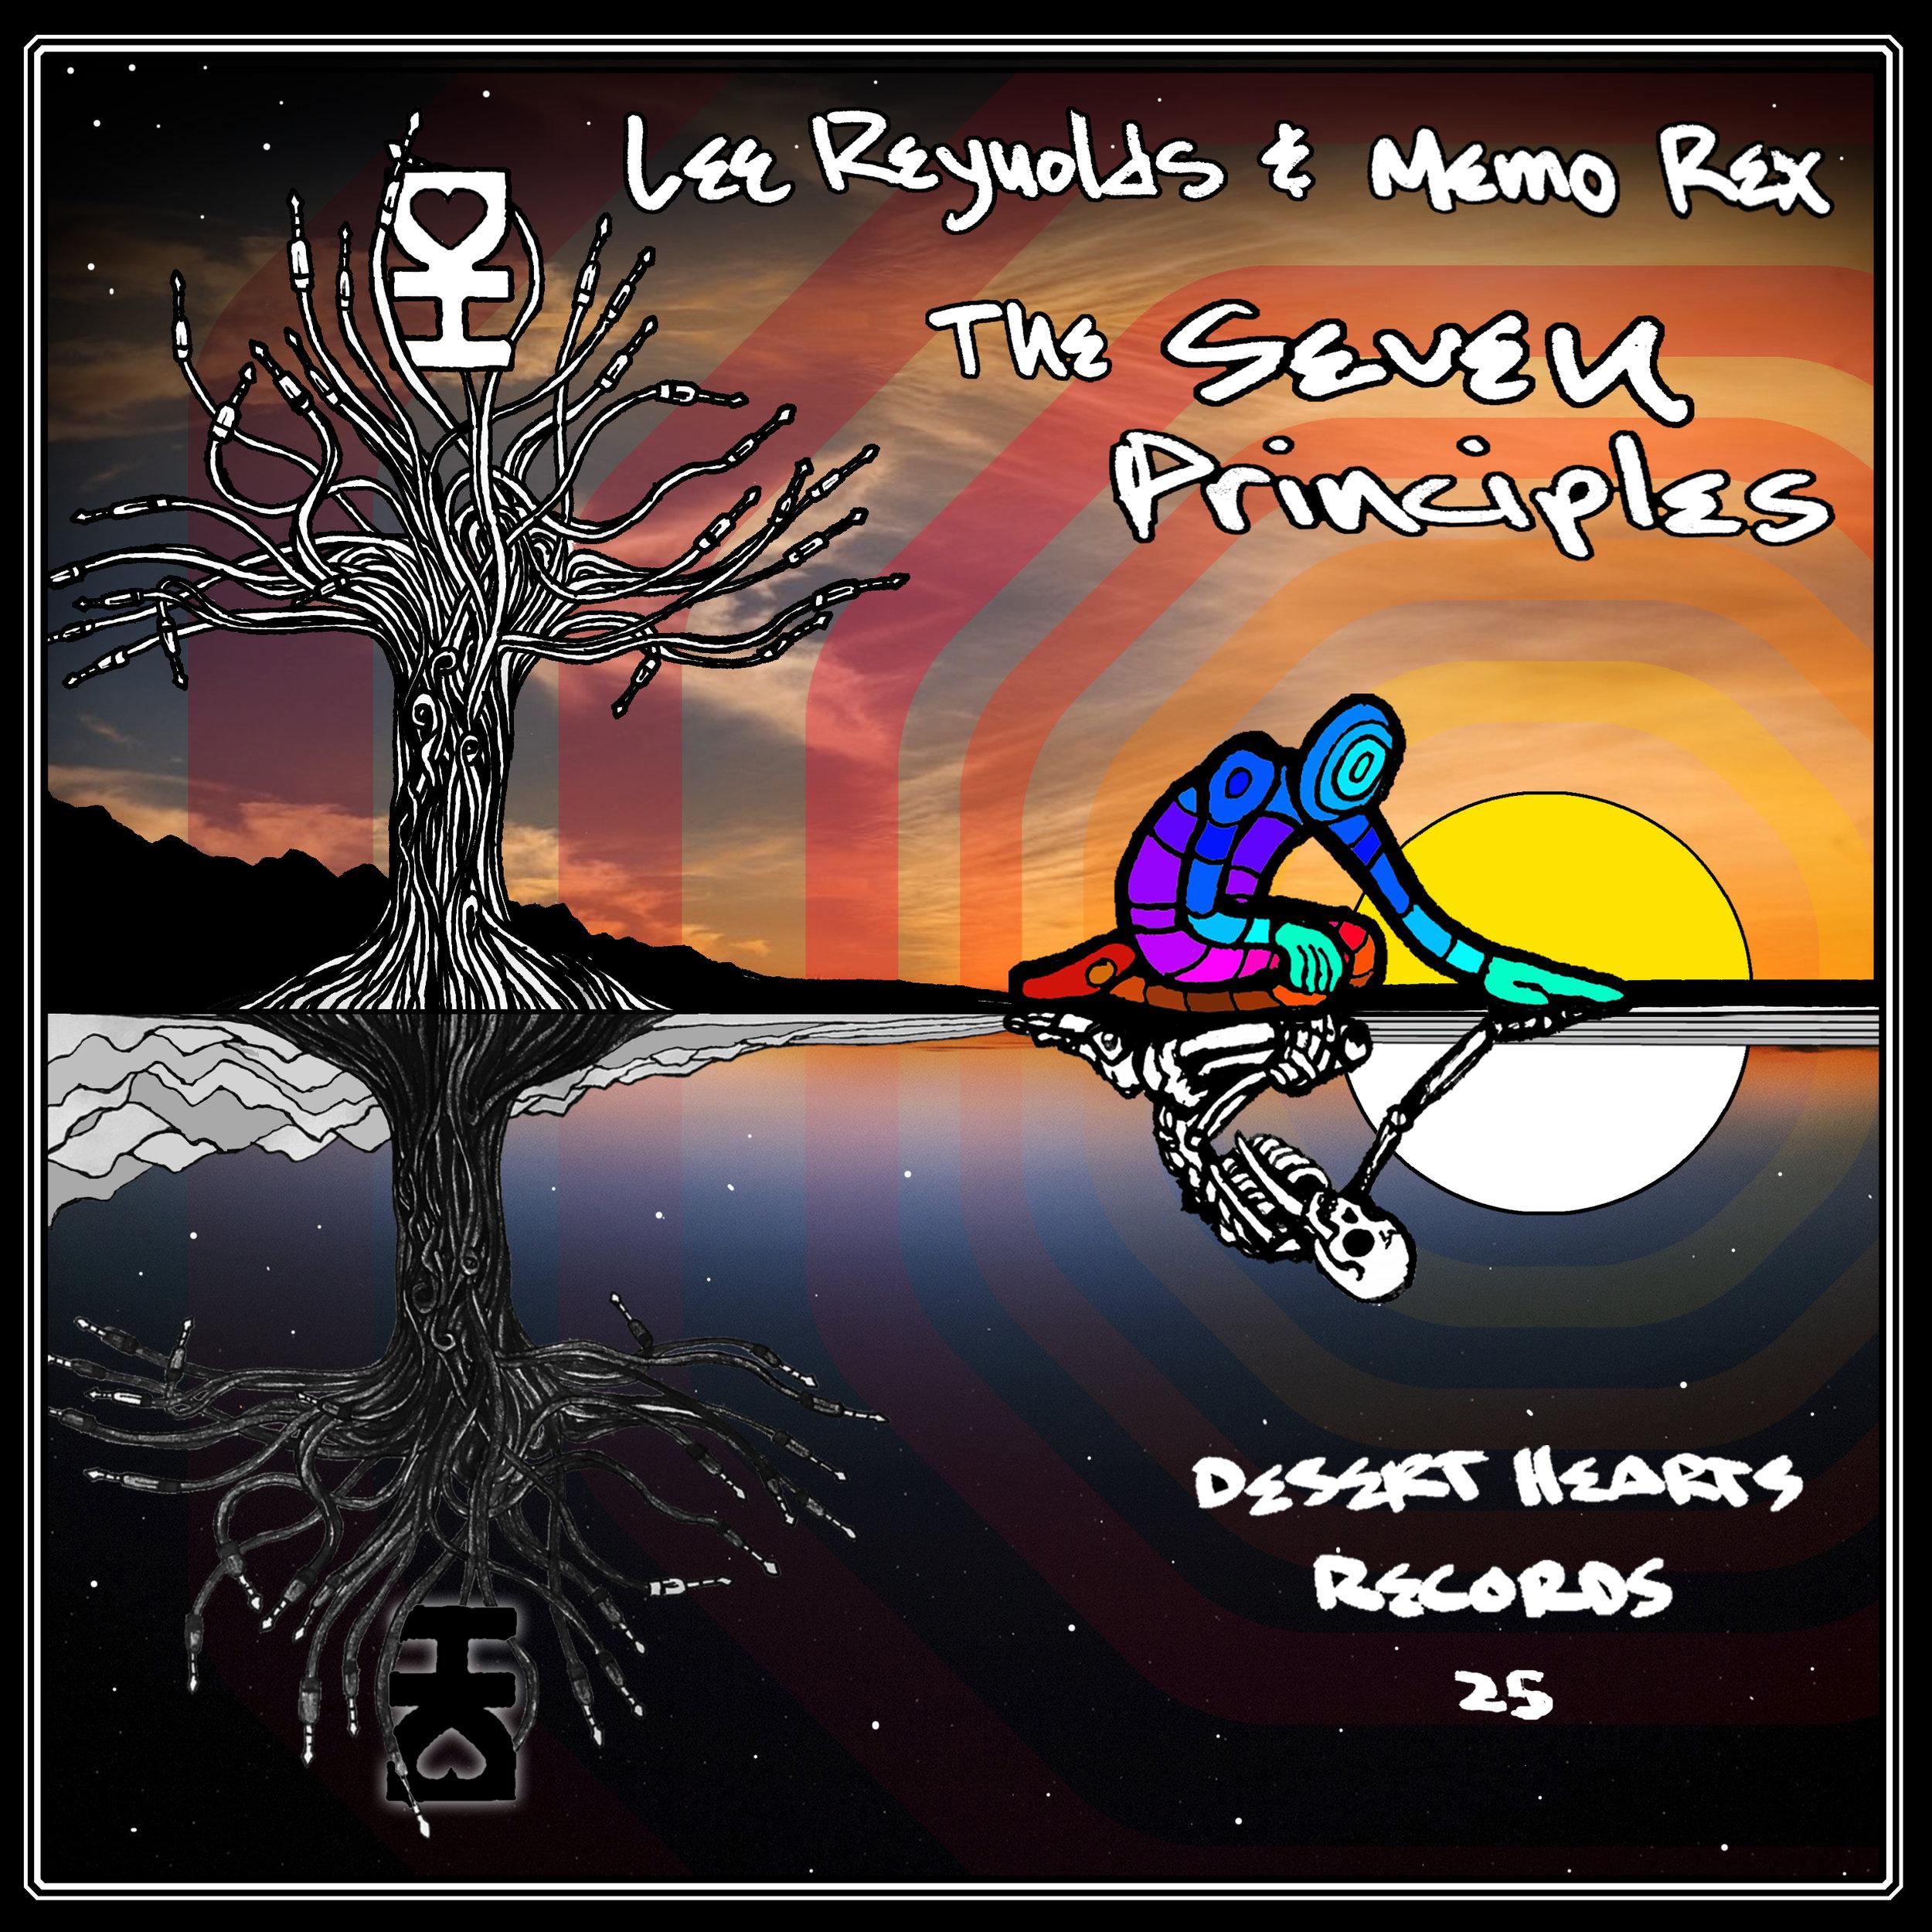 LEE&MEMO EP ART [SQUARE].jpg